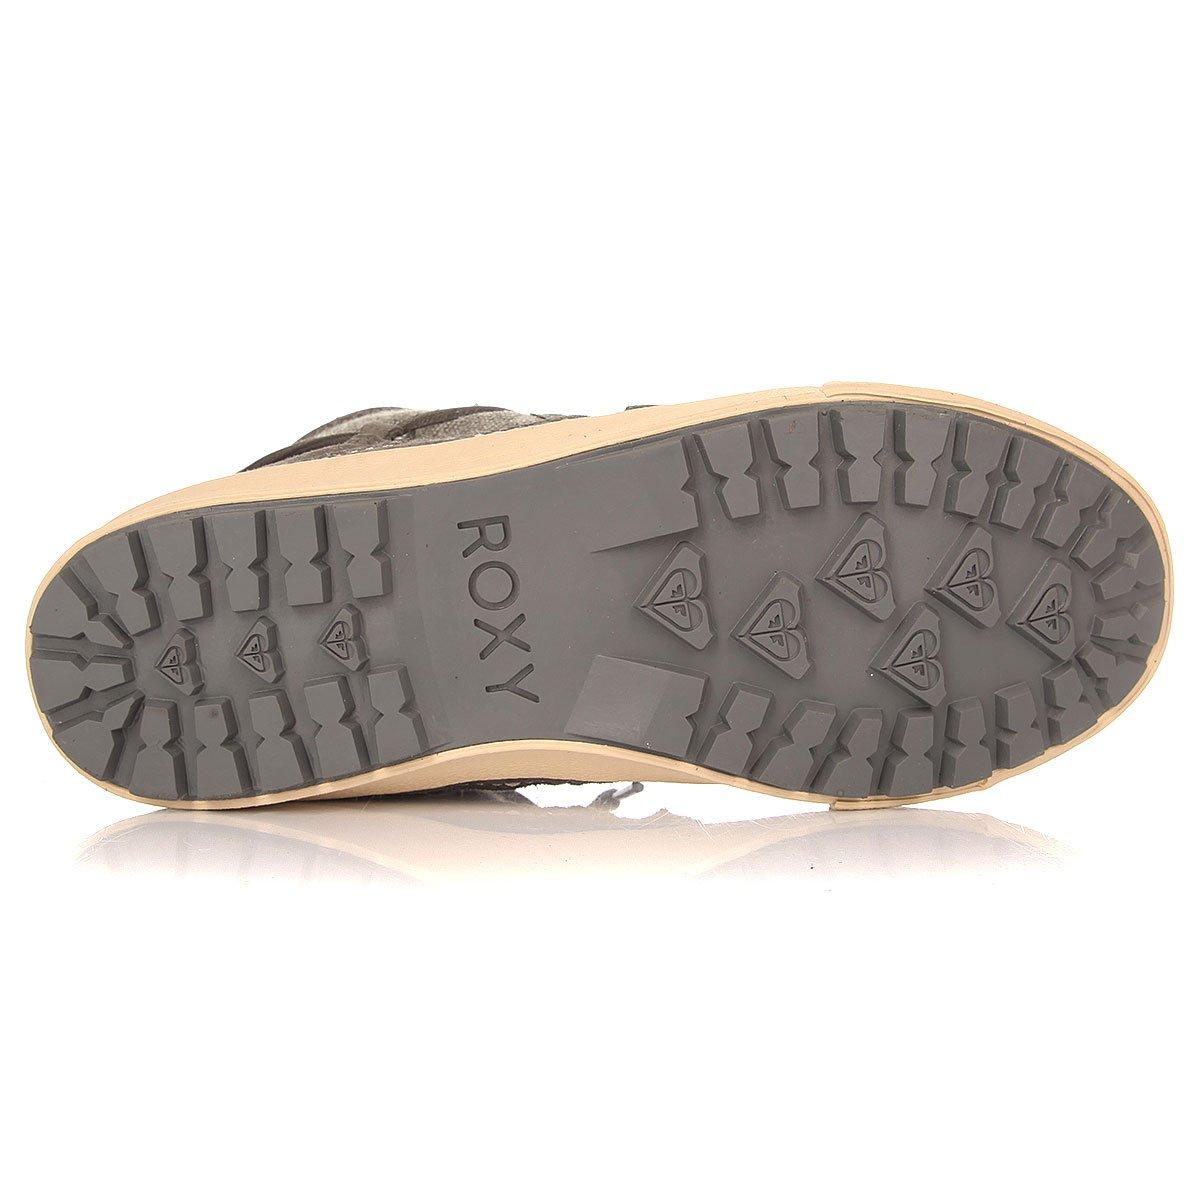 Купить сапоги зимние женские Roxy Whistler Charcoal (ARJB300007-CHR ... bbddfbc6990